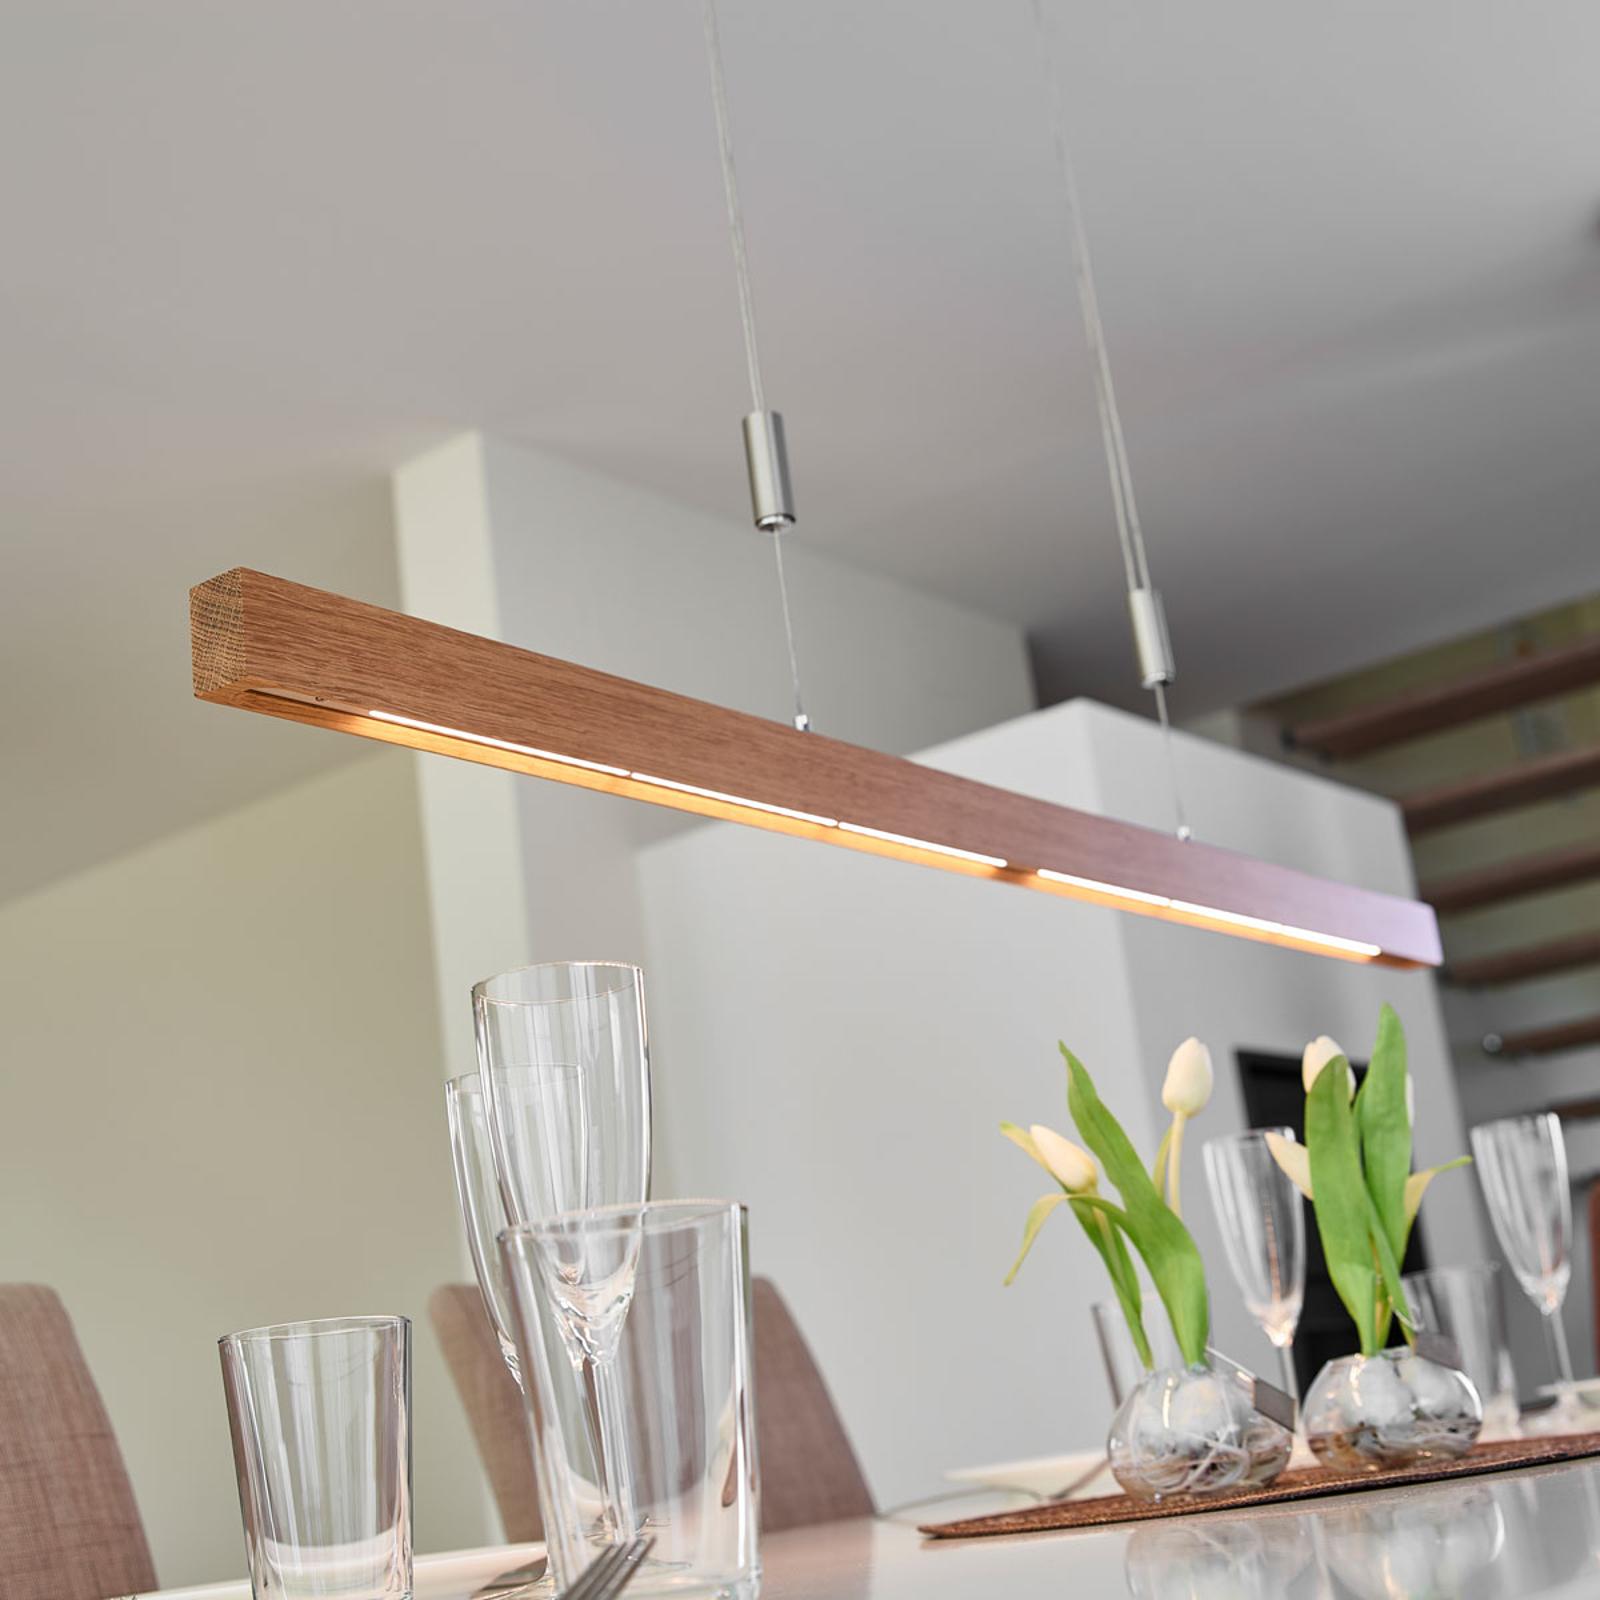 Suspension LED en chêne Nora, dimmable